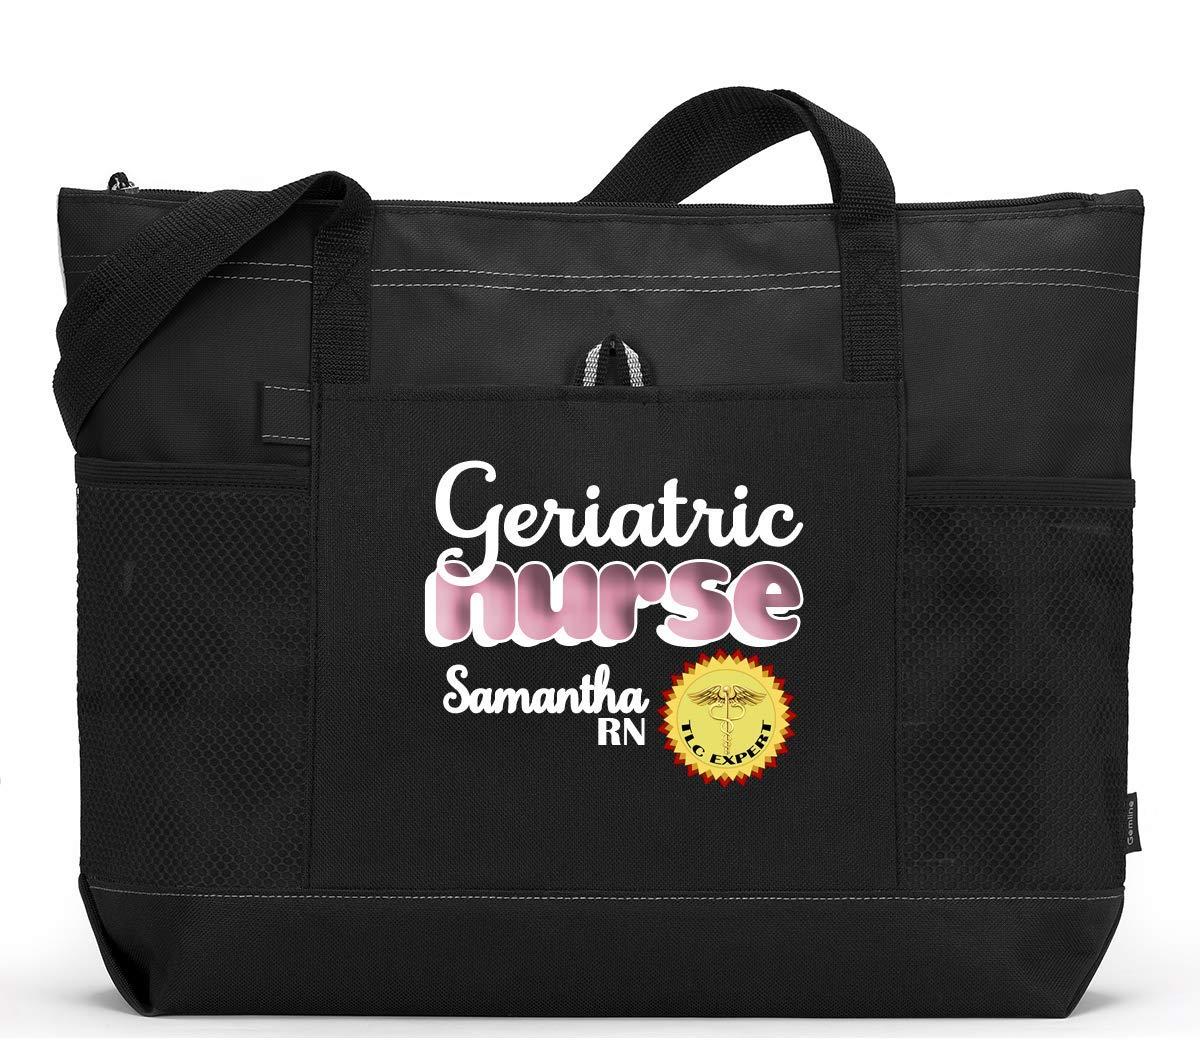 Geriatric Nurse, RN, LPN Personalized Zippered Tote Bag